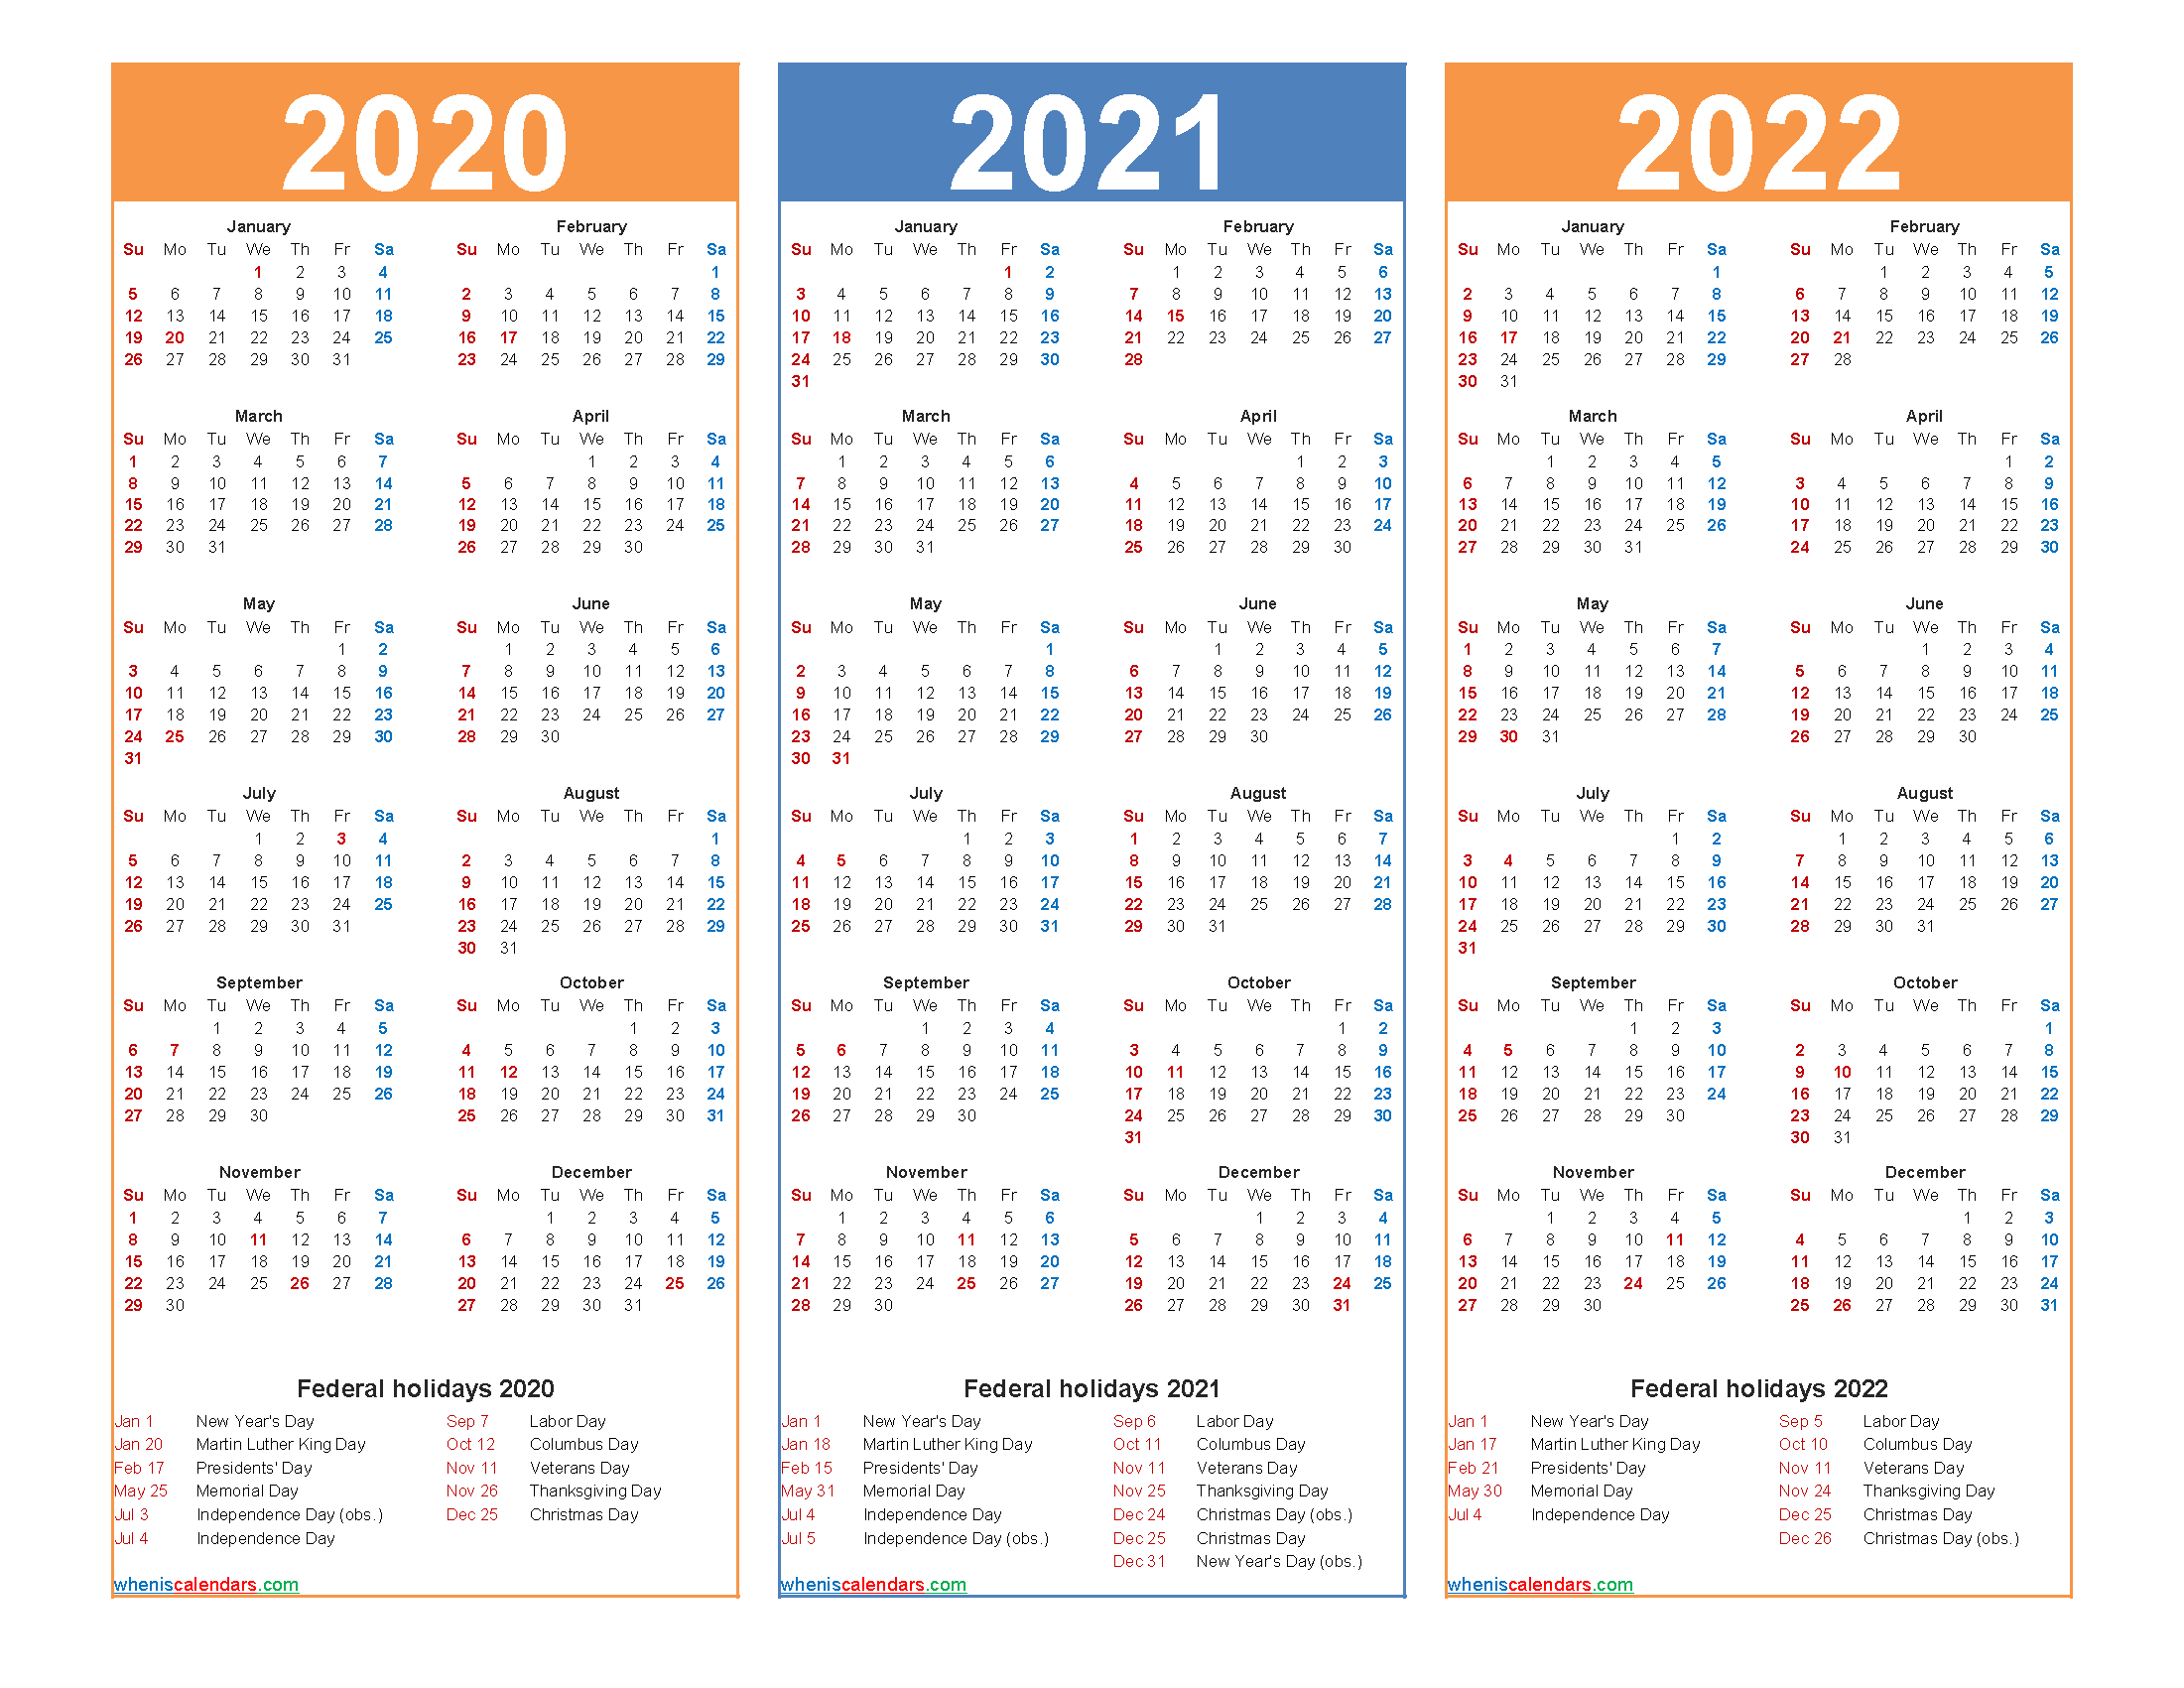 Printable Calendar 2020 2021 2022 with Holidays - Free ...